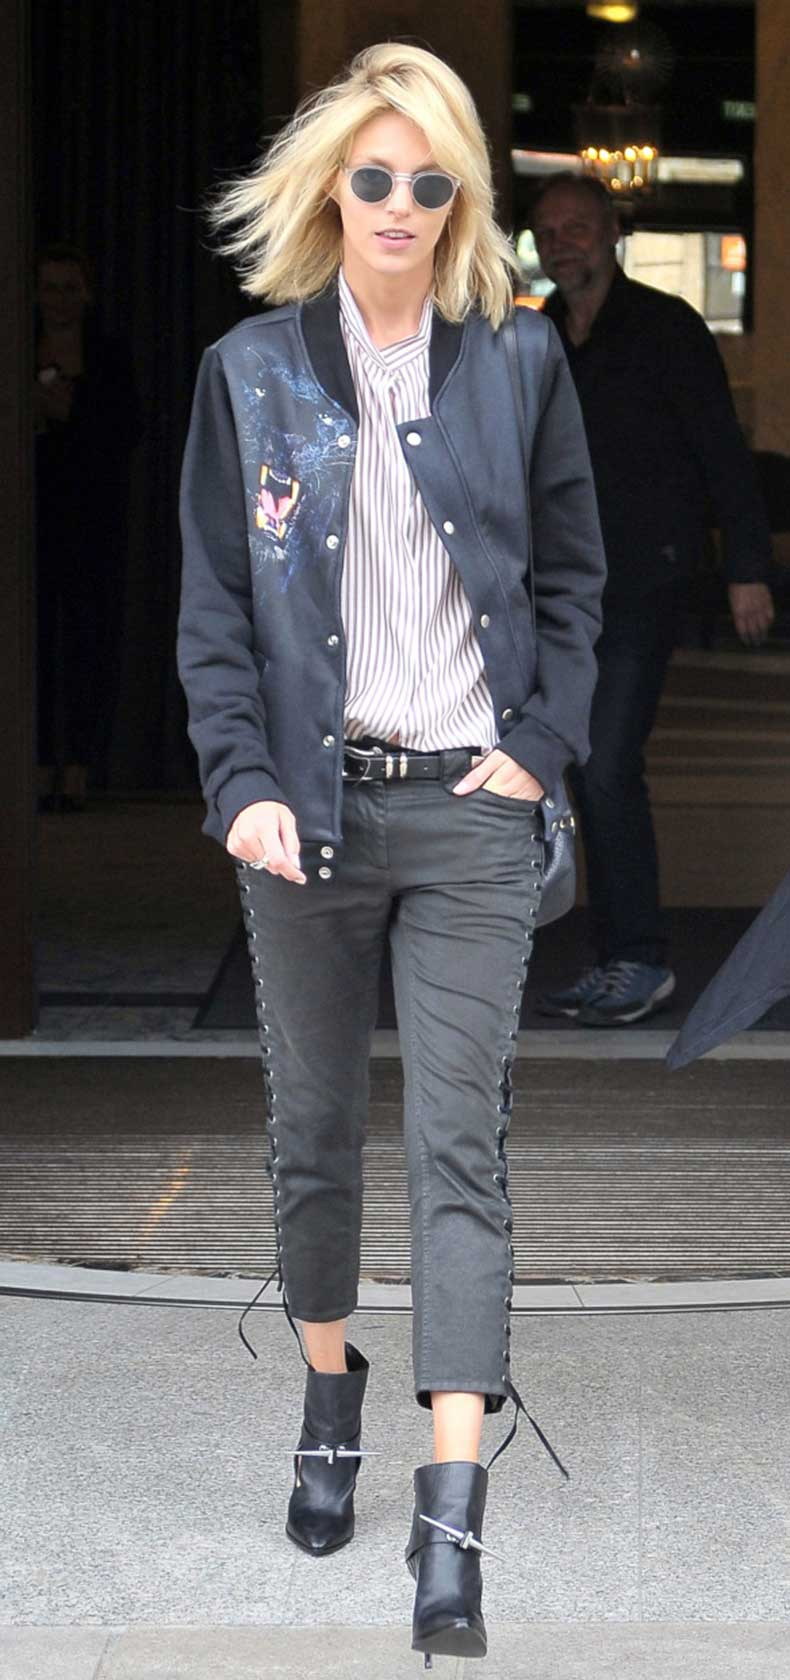 la-modella-mafia-Anja-Rubik-in-a-Givenchy-panther-bomber-jacket-2013-street-style